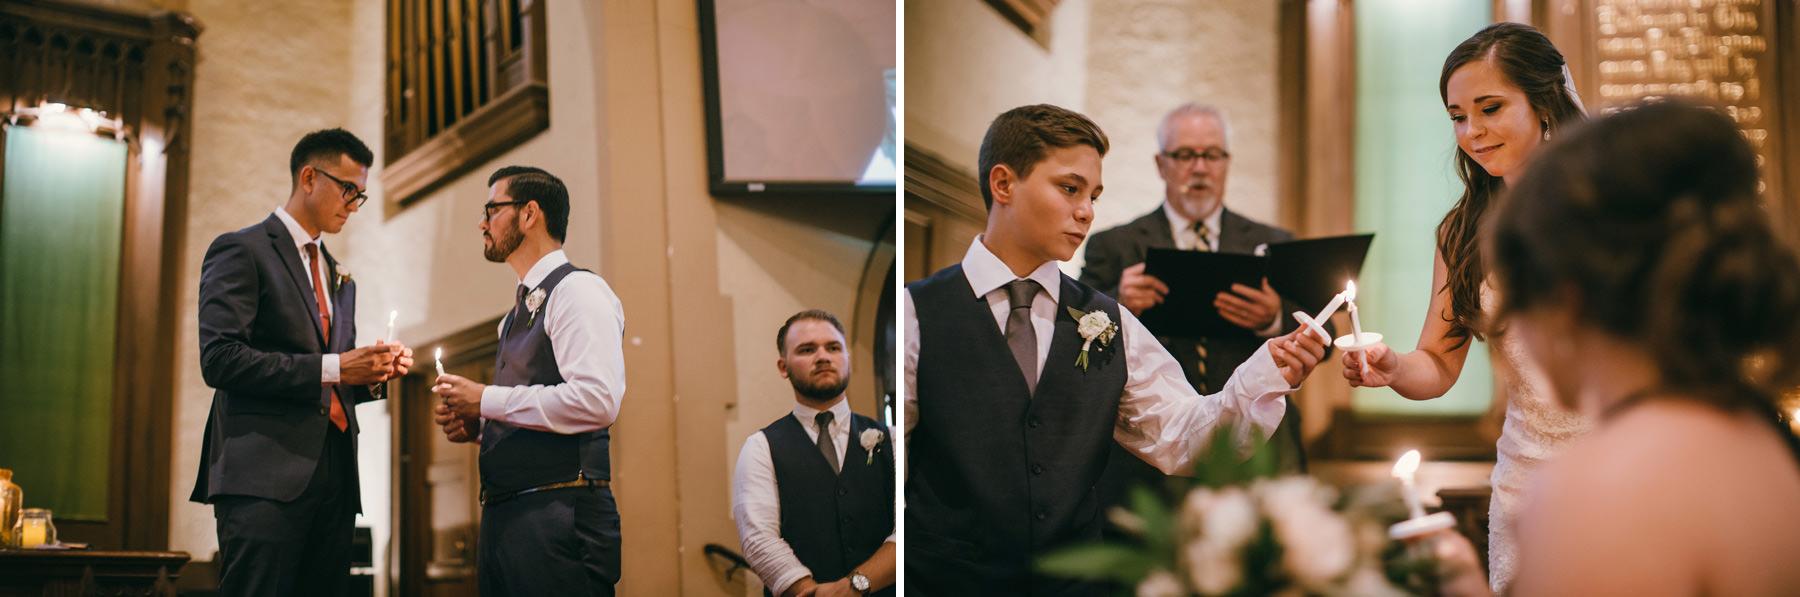 Kansas City Summer Wedding at the Guild_Kindling Wedding Photography Blog54.JPG